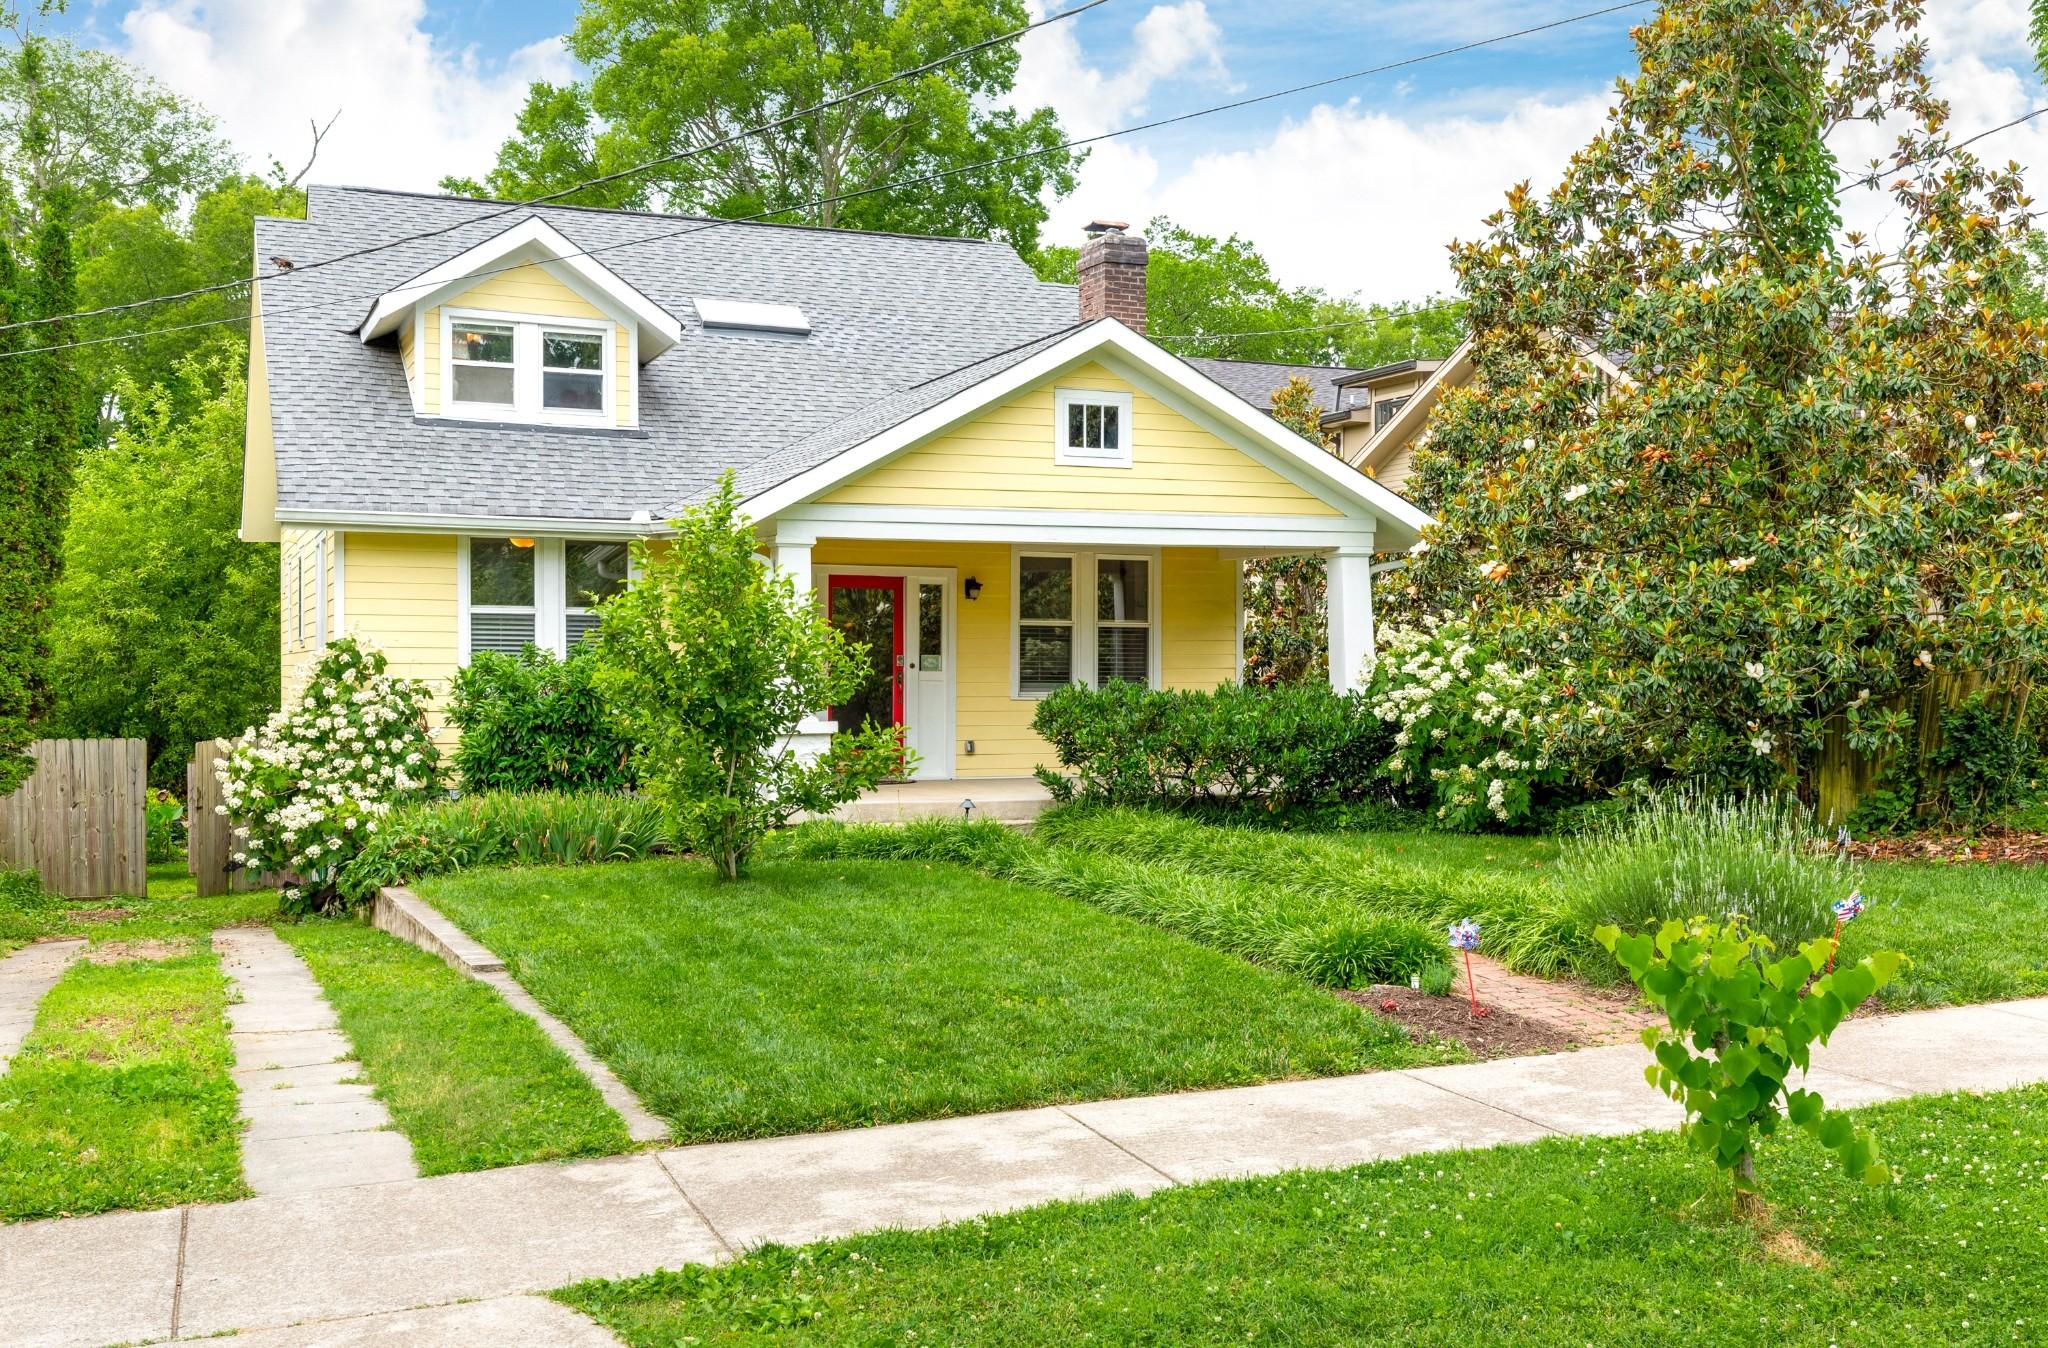 3620 Westbrook Ave Property Photo - Nashville, TN real estate listing